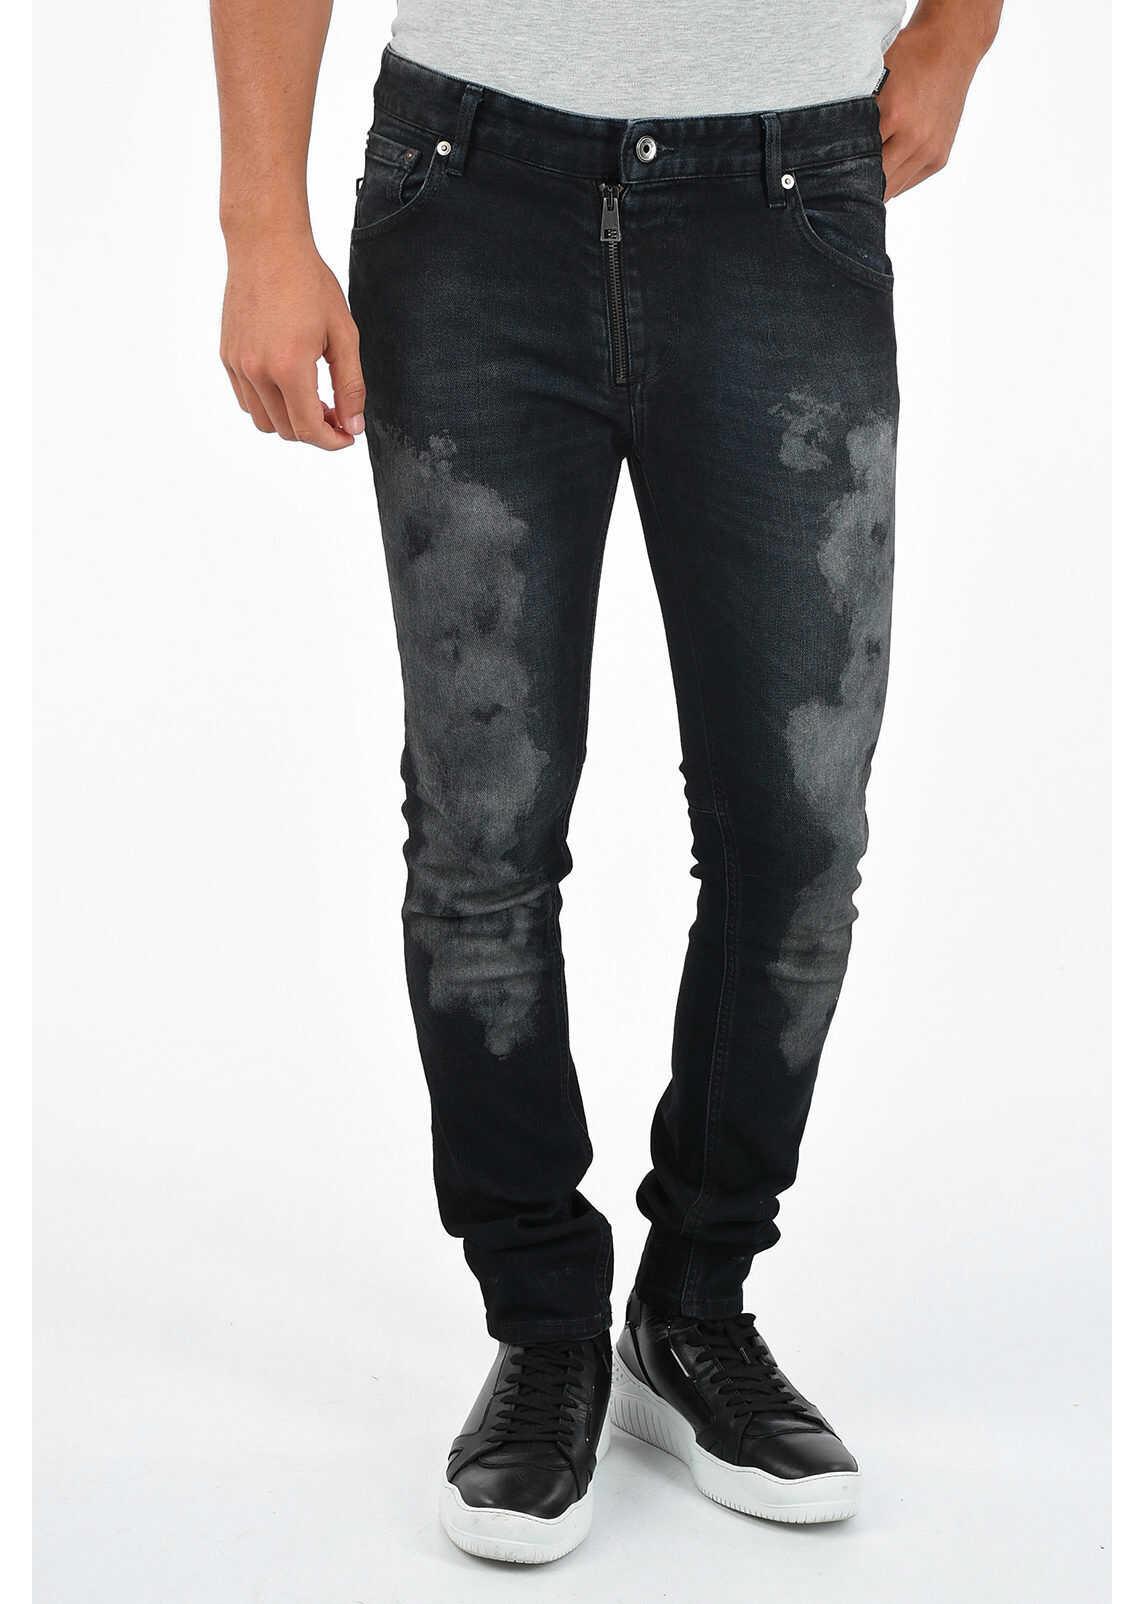 15cm Stretch Denim Printed Jeans thumbnail